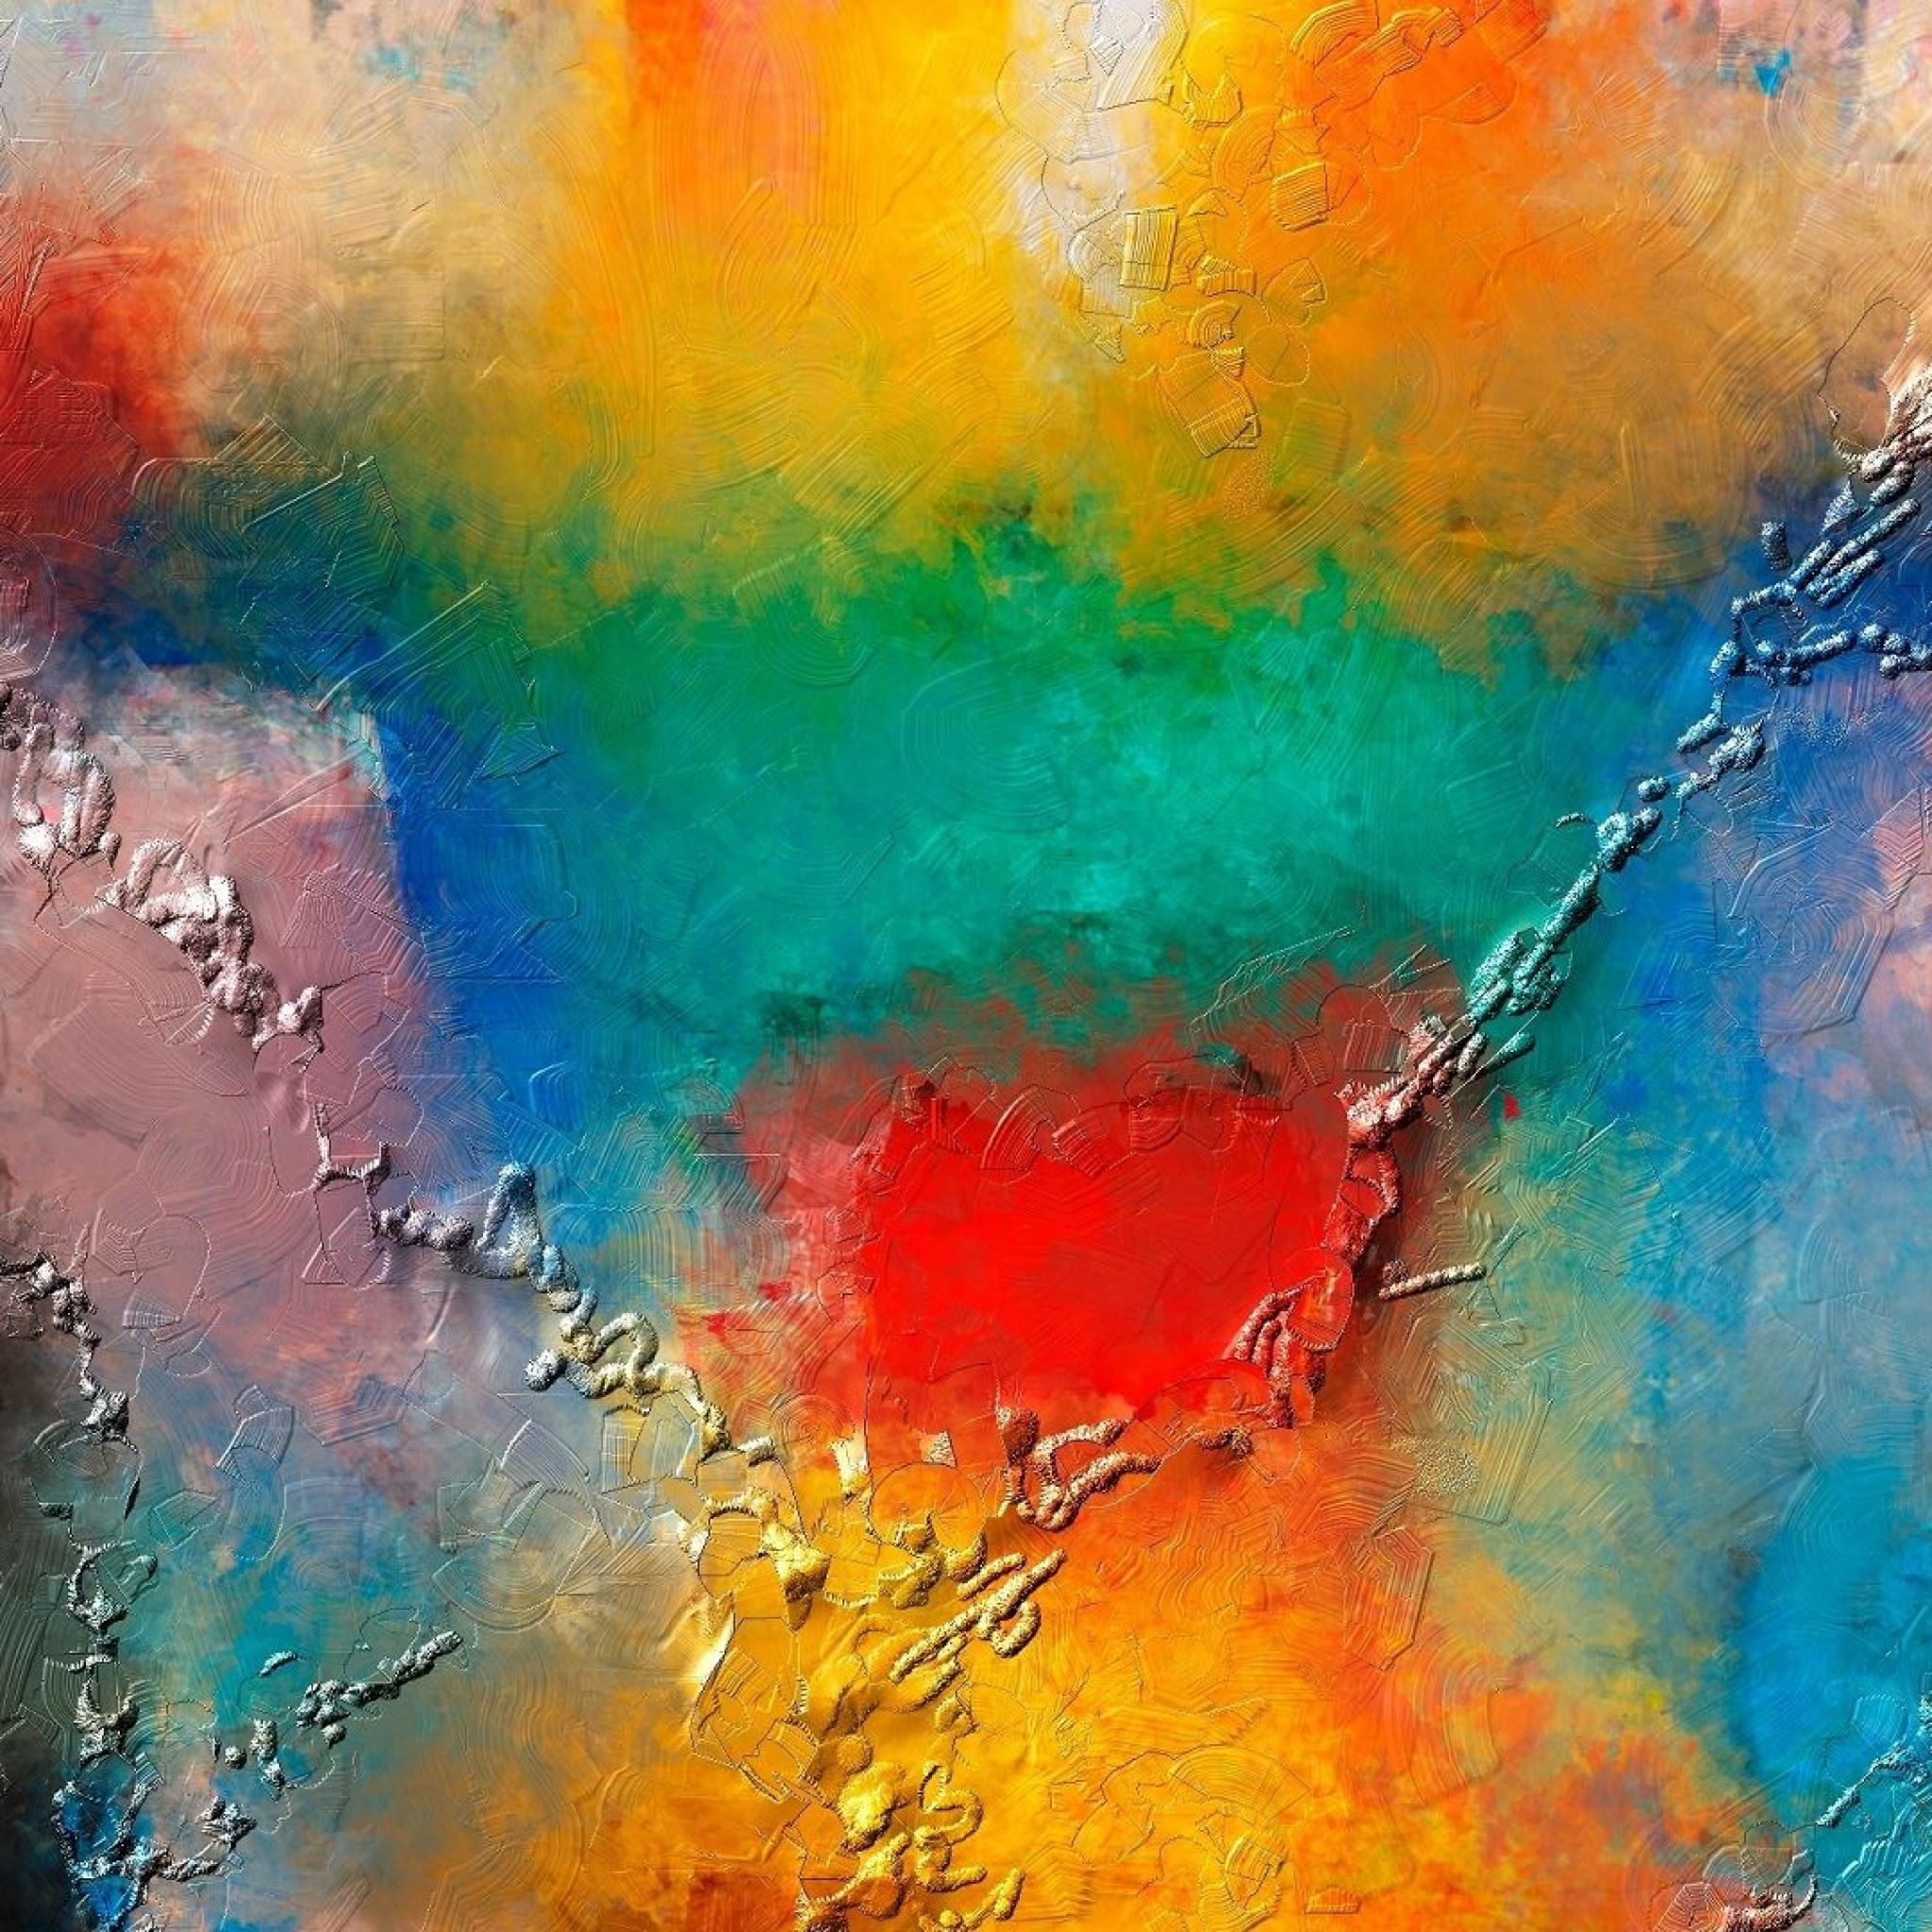 Paints Range Palette Ipad Air Wallpapers Free Download